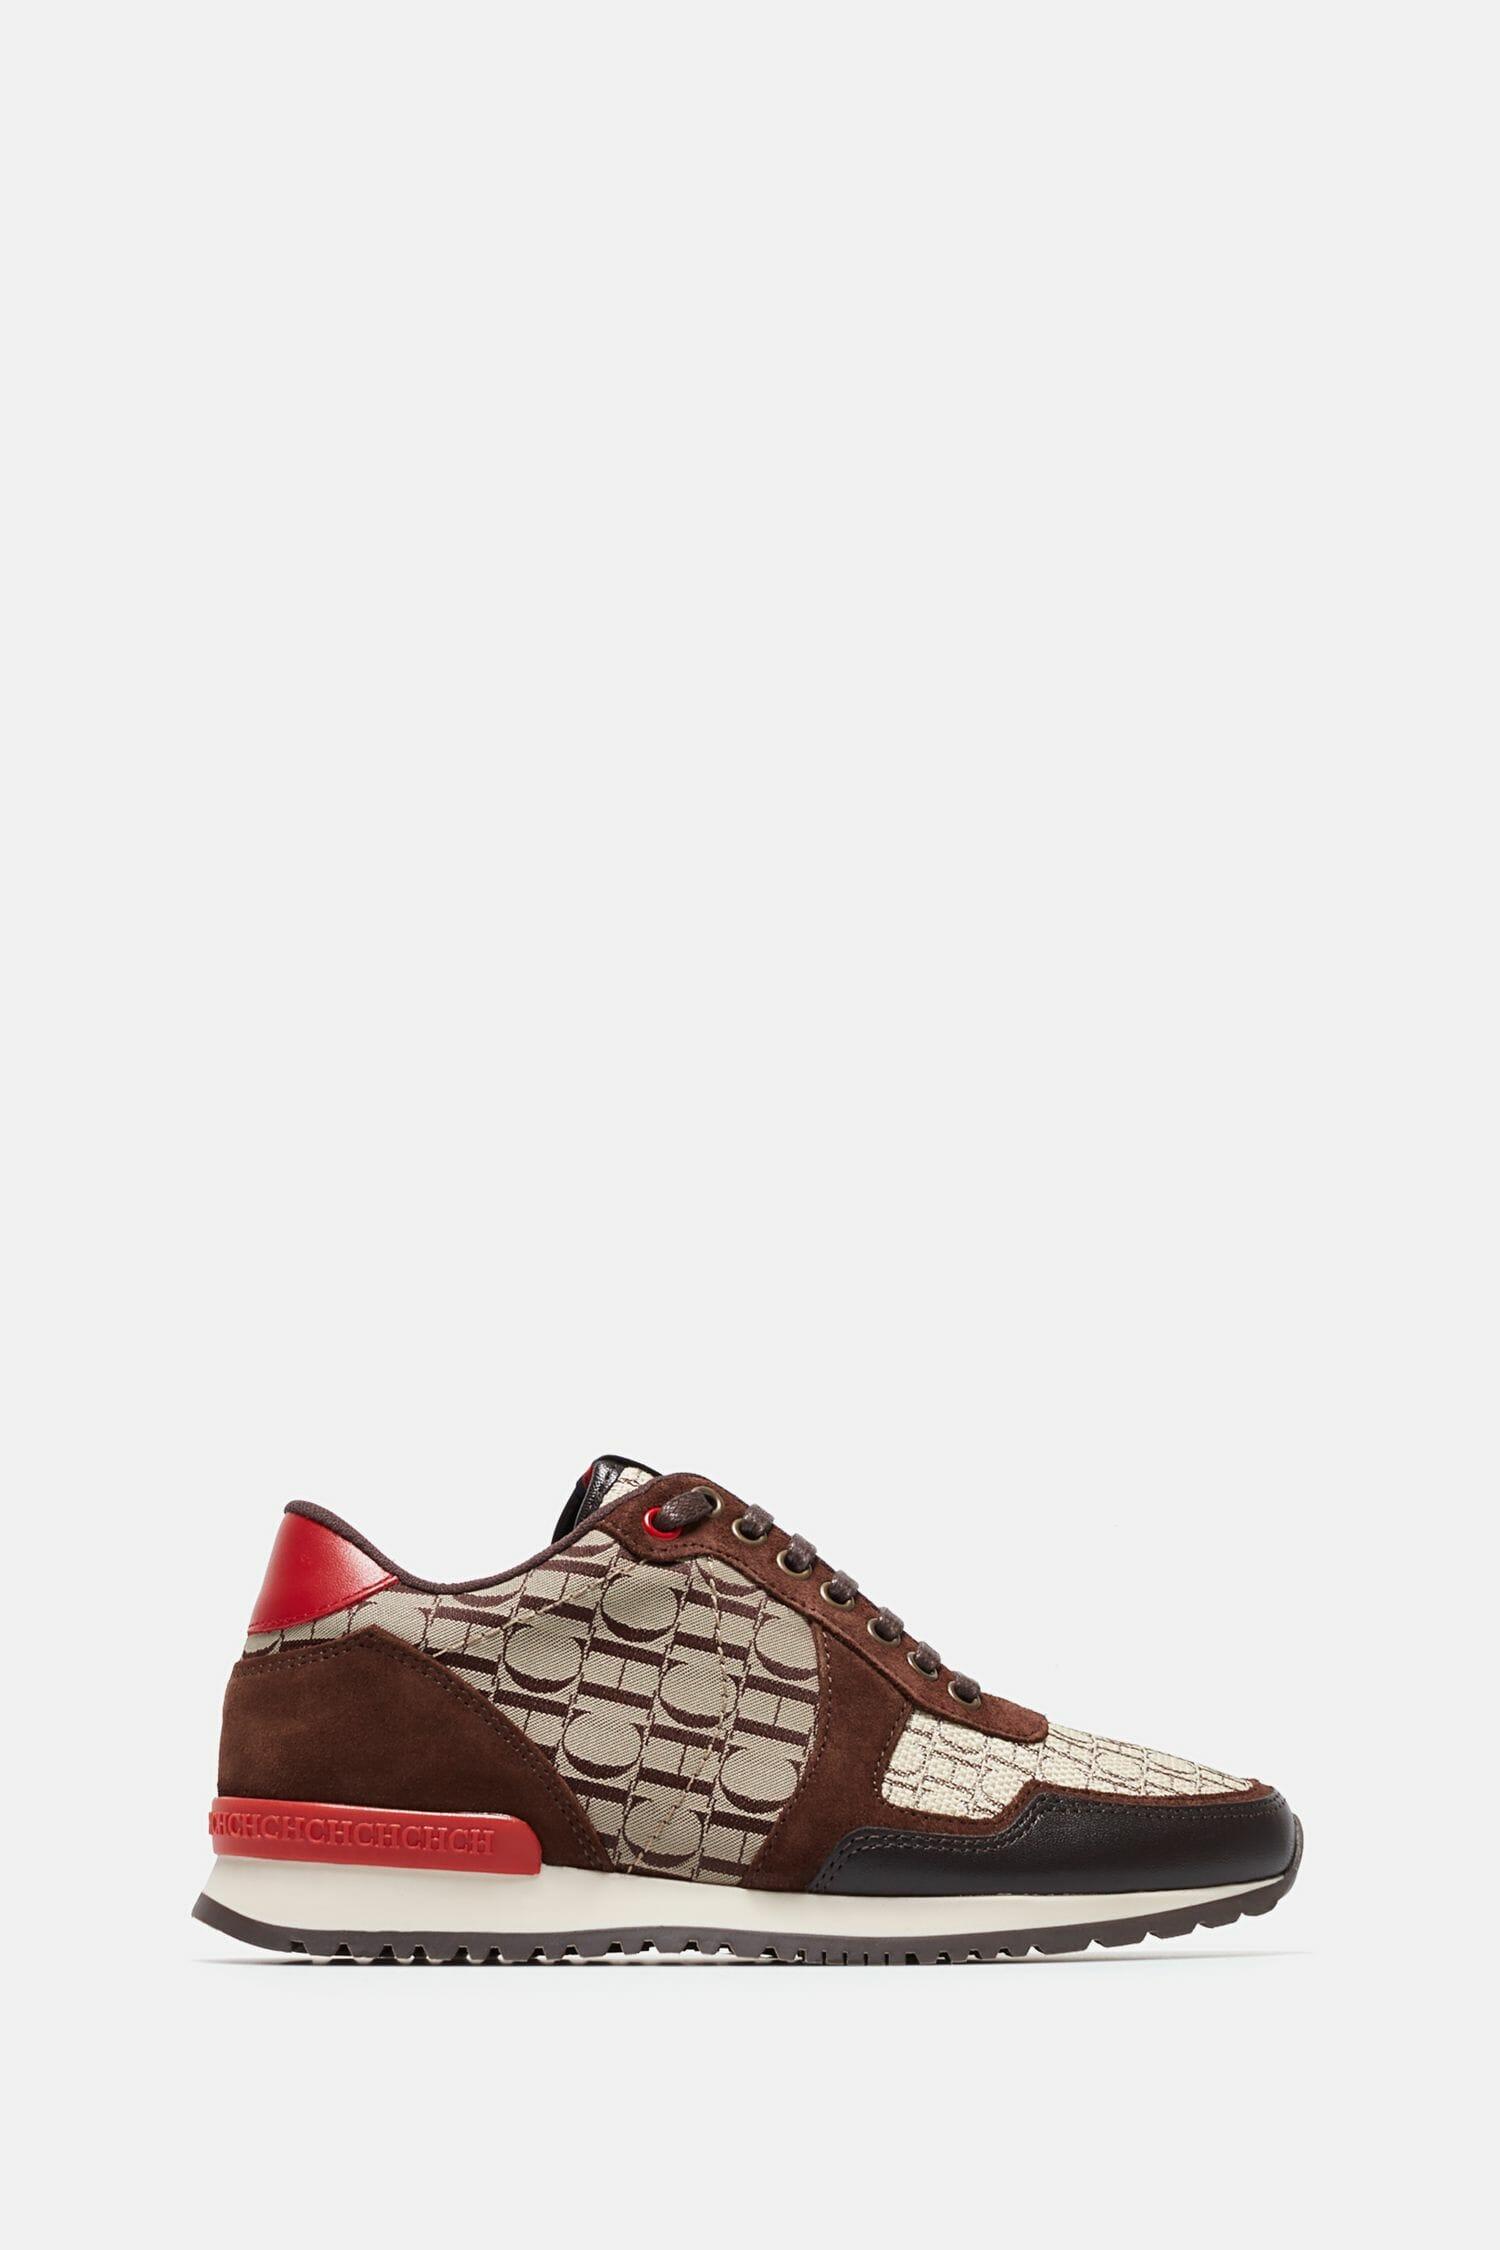 Ch Carolina Herrera Shoes Online